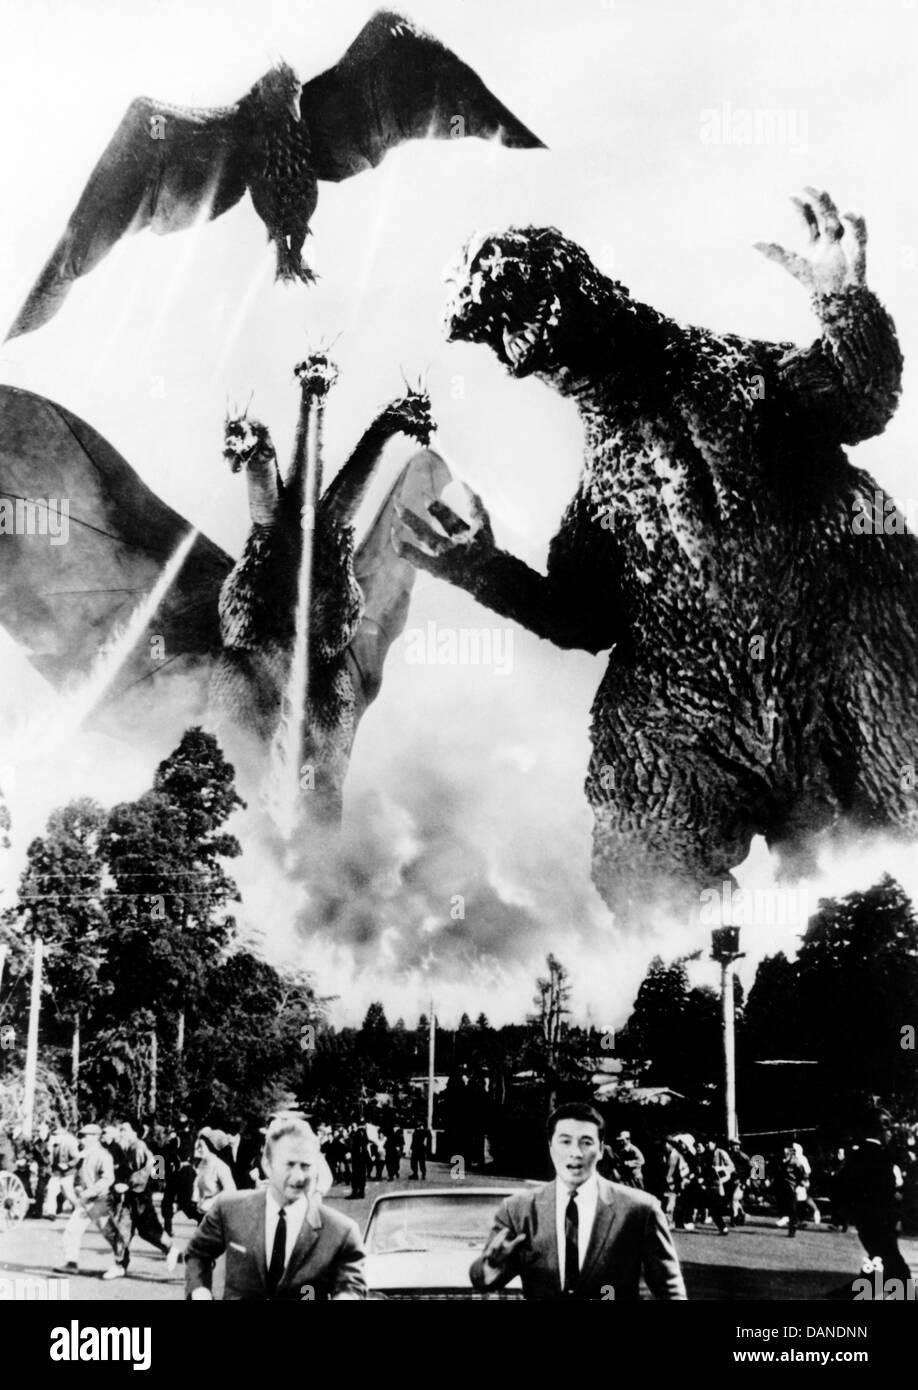 GODZILLA RAIDS AGAIN (1955) GOJIRA NO GYAKUSHU (ALT) GIGANTIS THE FIRE MONSTER (ALT) MOTOYOSHI ODA (DIR) GFM 002 - Stock Image